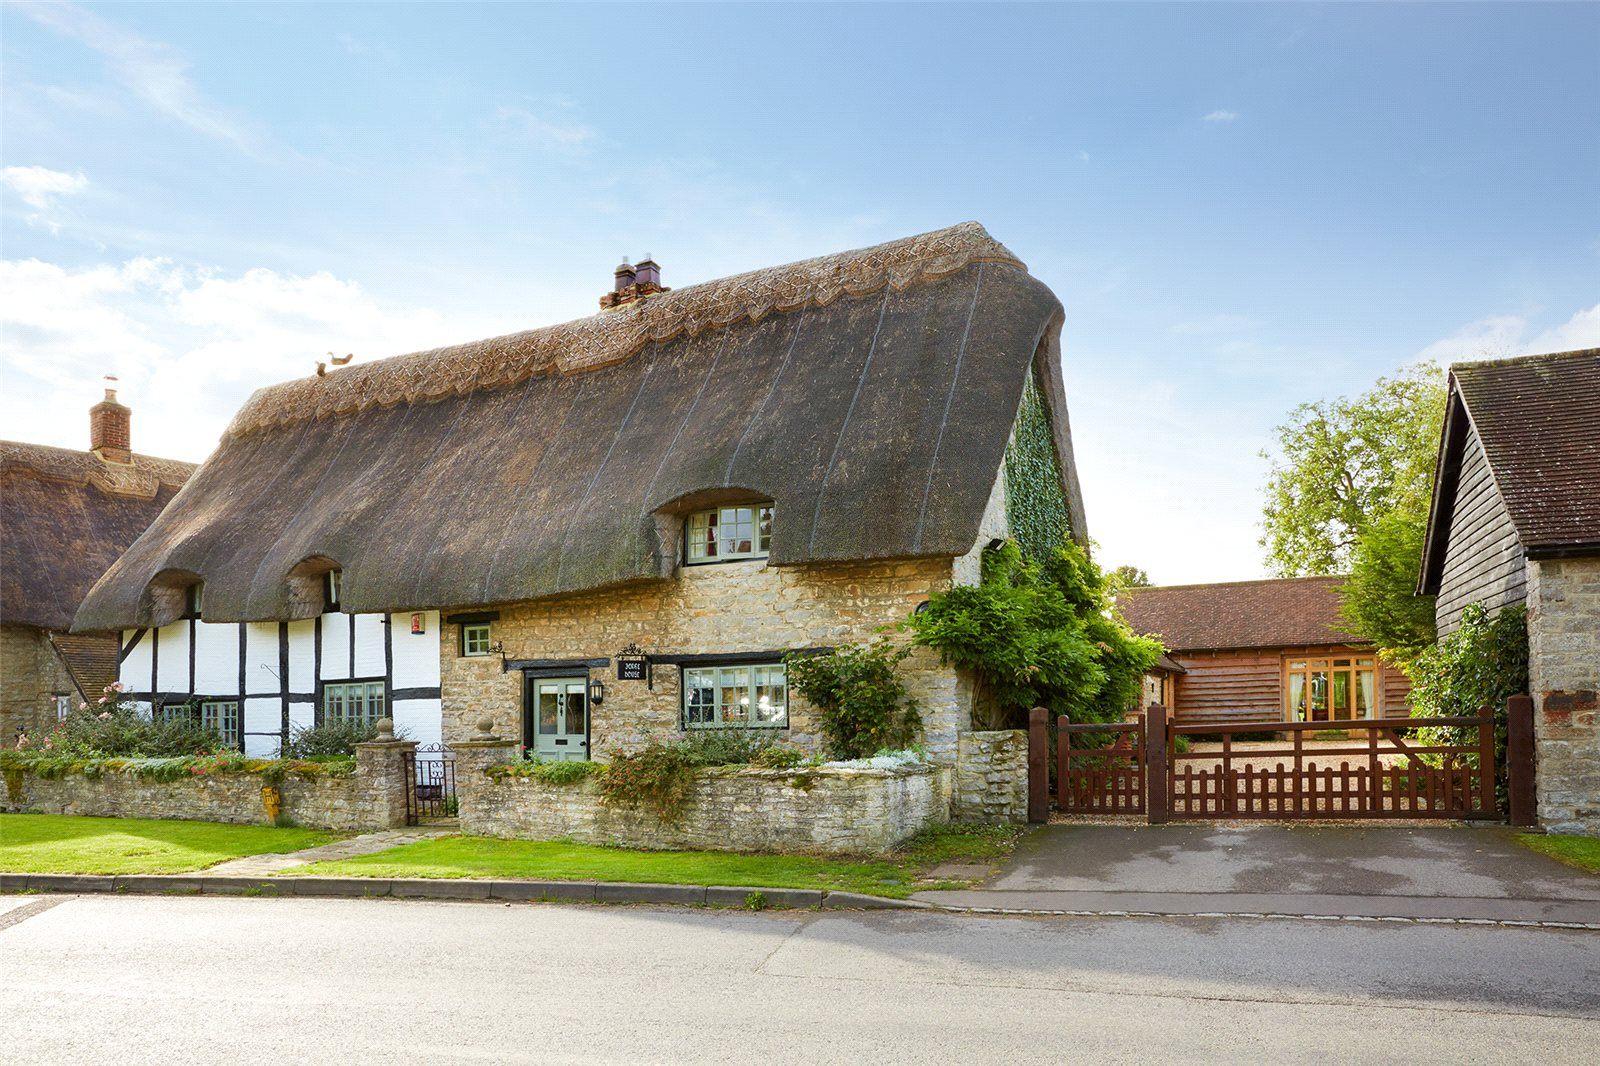 Частный дом для того Продажа на Church Street, Marsh Gibbon, Bicester, Oxfordshire, OX27 Bicester, Англия